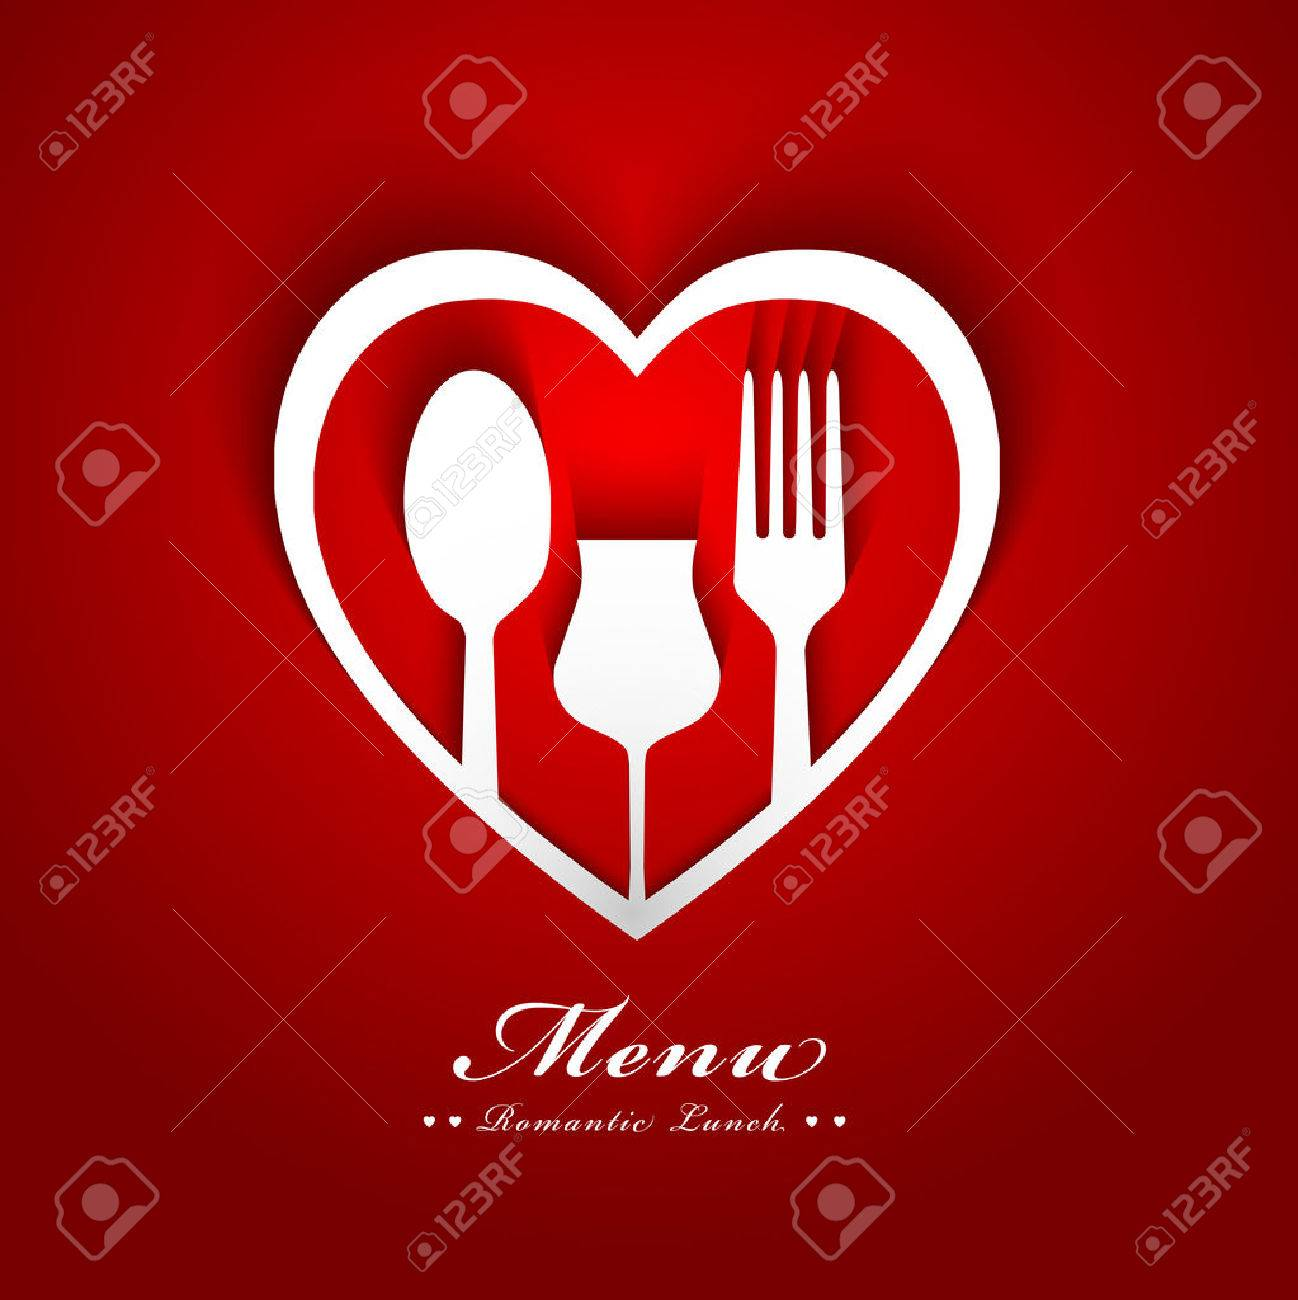 romantic lunch menu design - 24507275